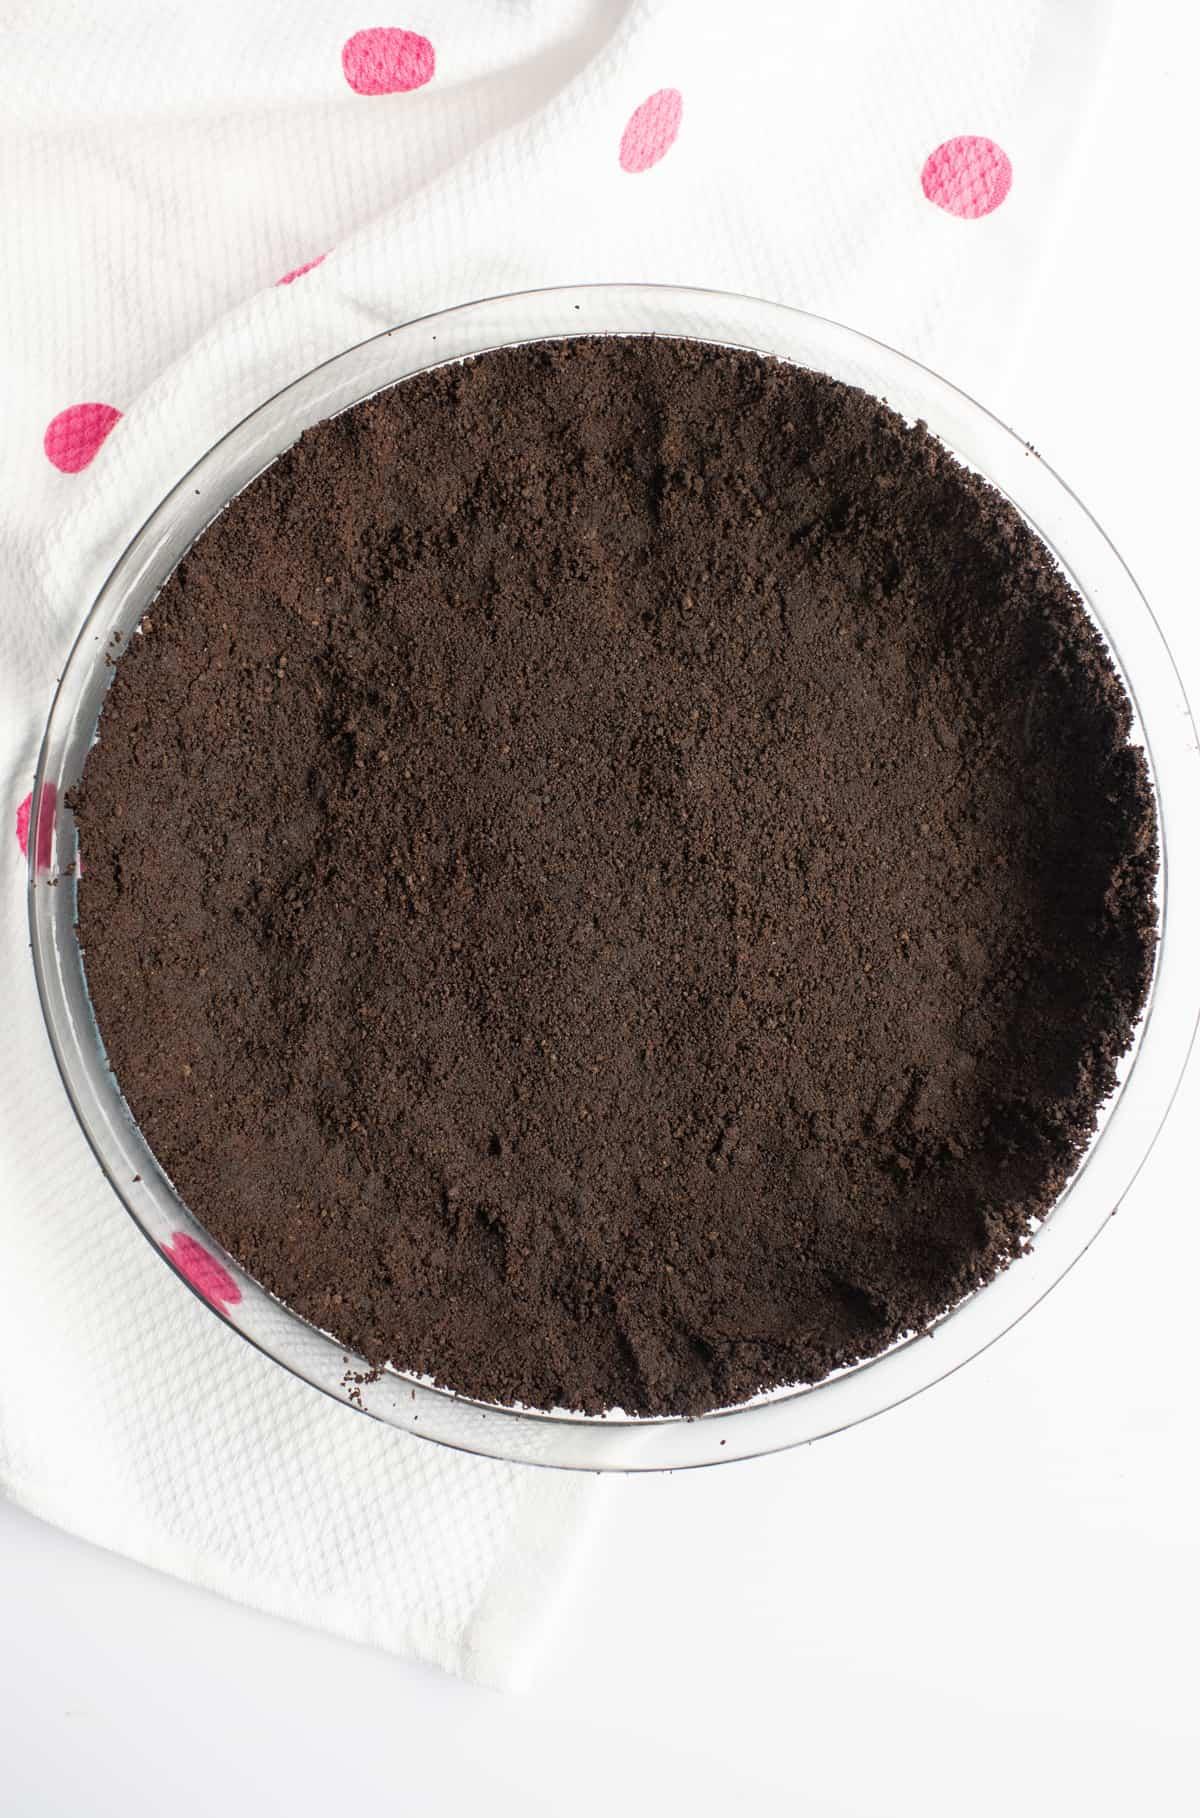 chocolate graham cracker crust pressed into glass pie plate